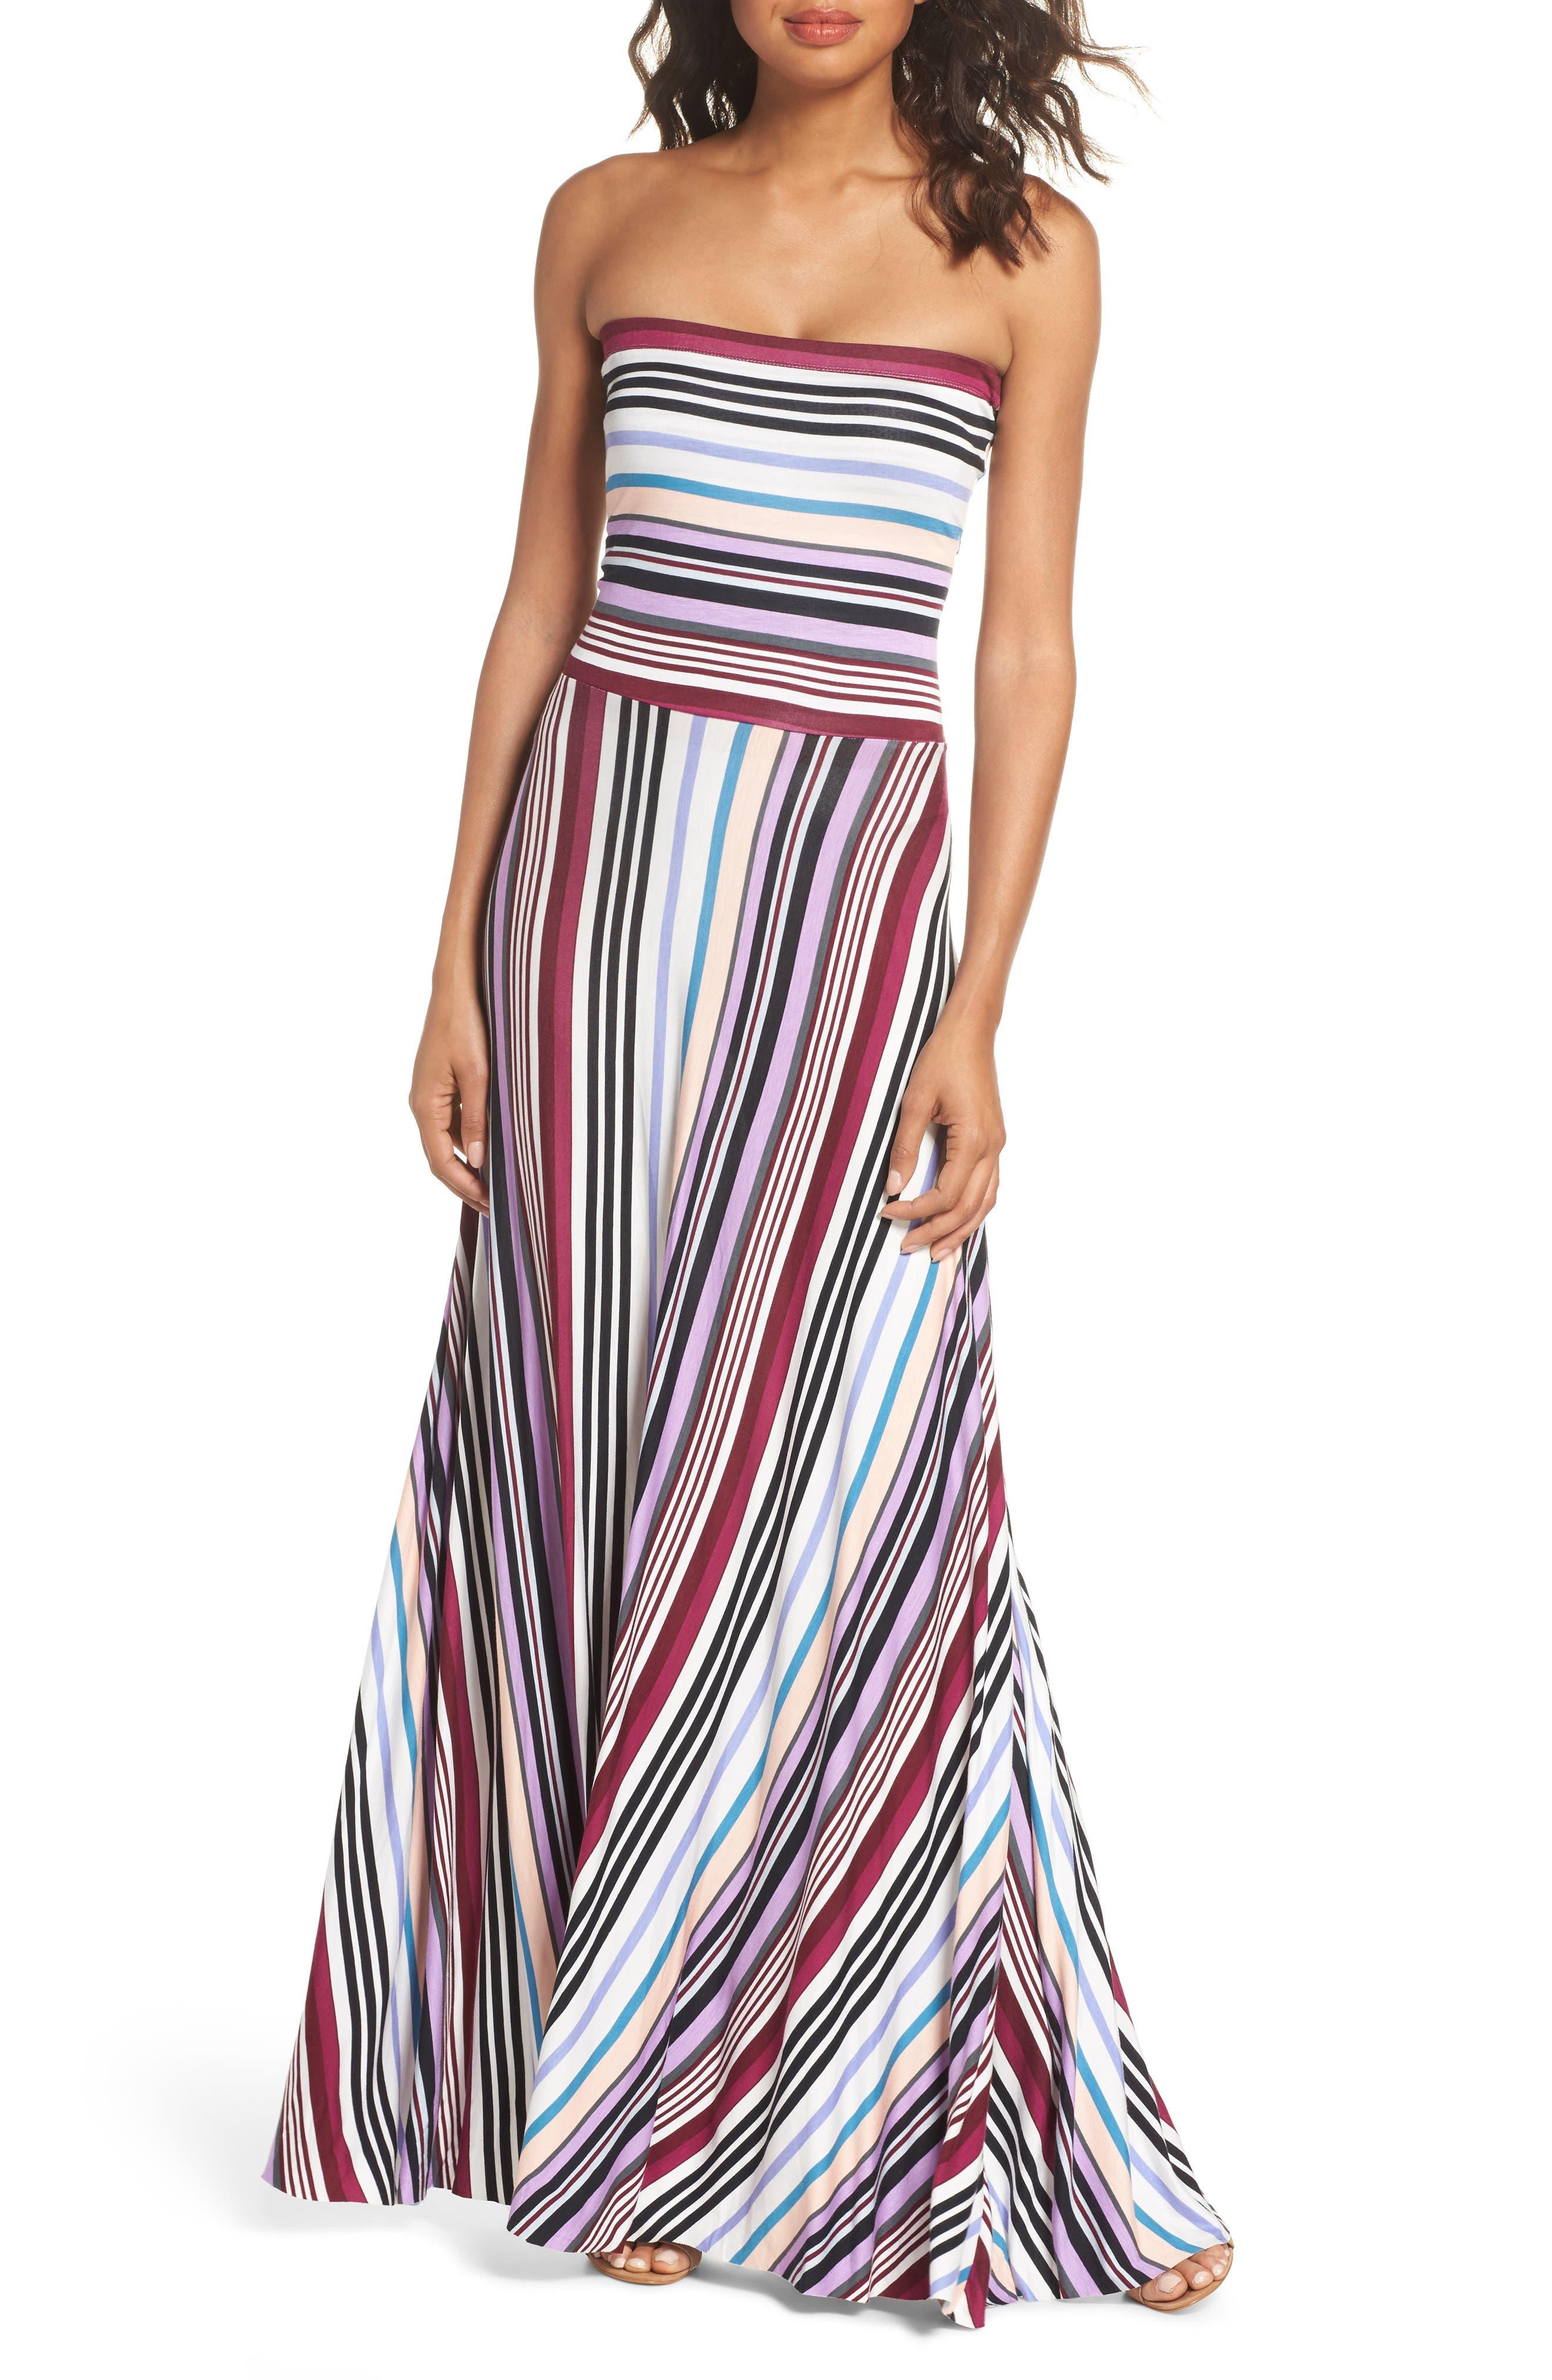 Clemette Strapless Maxi Dress,                         Main,                         color, Purple Multi Stripe